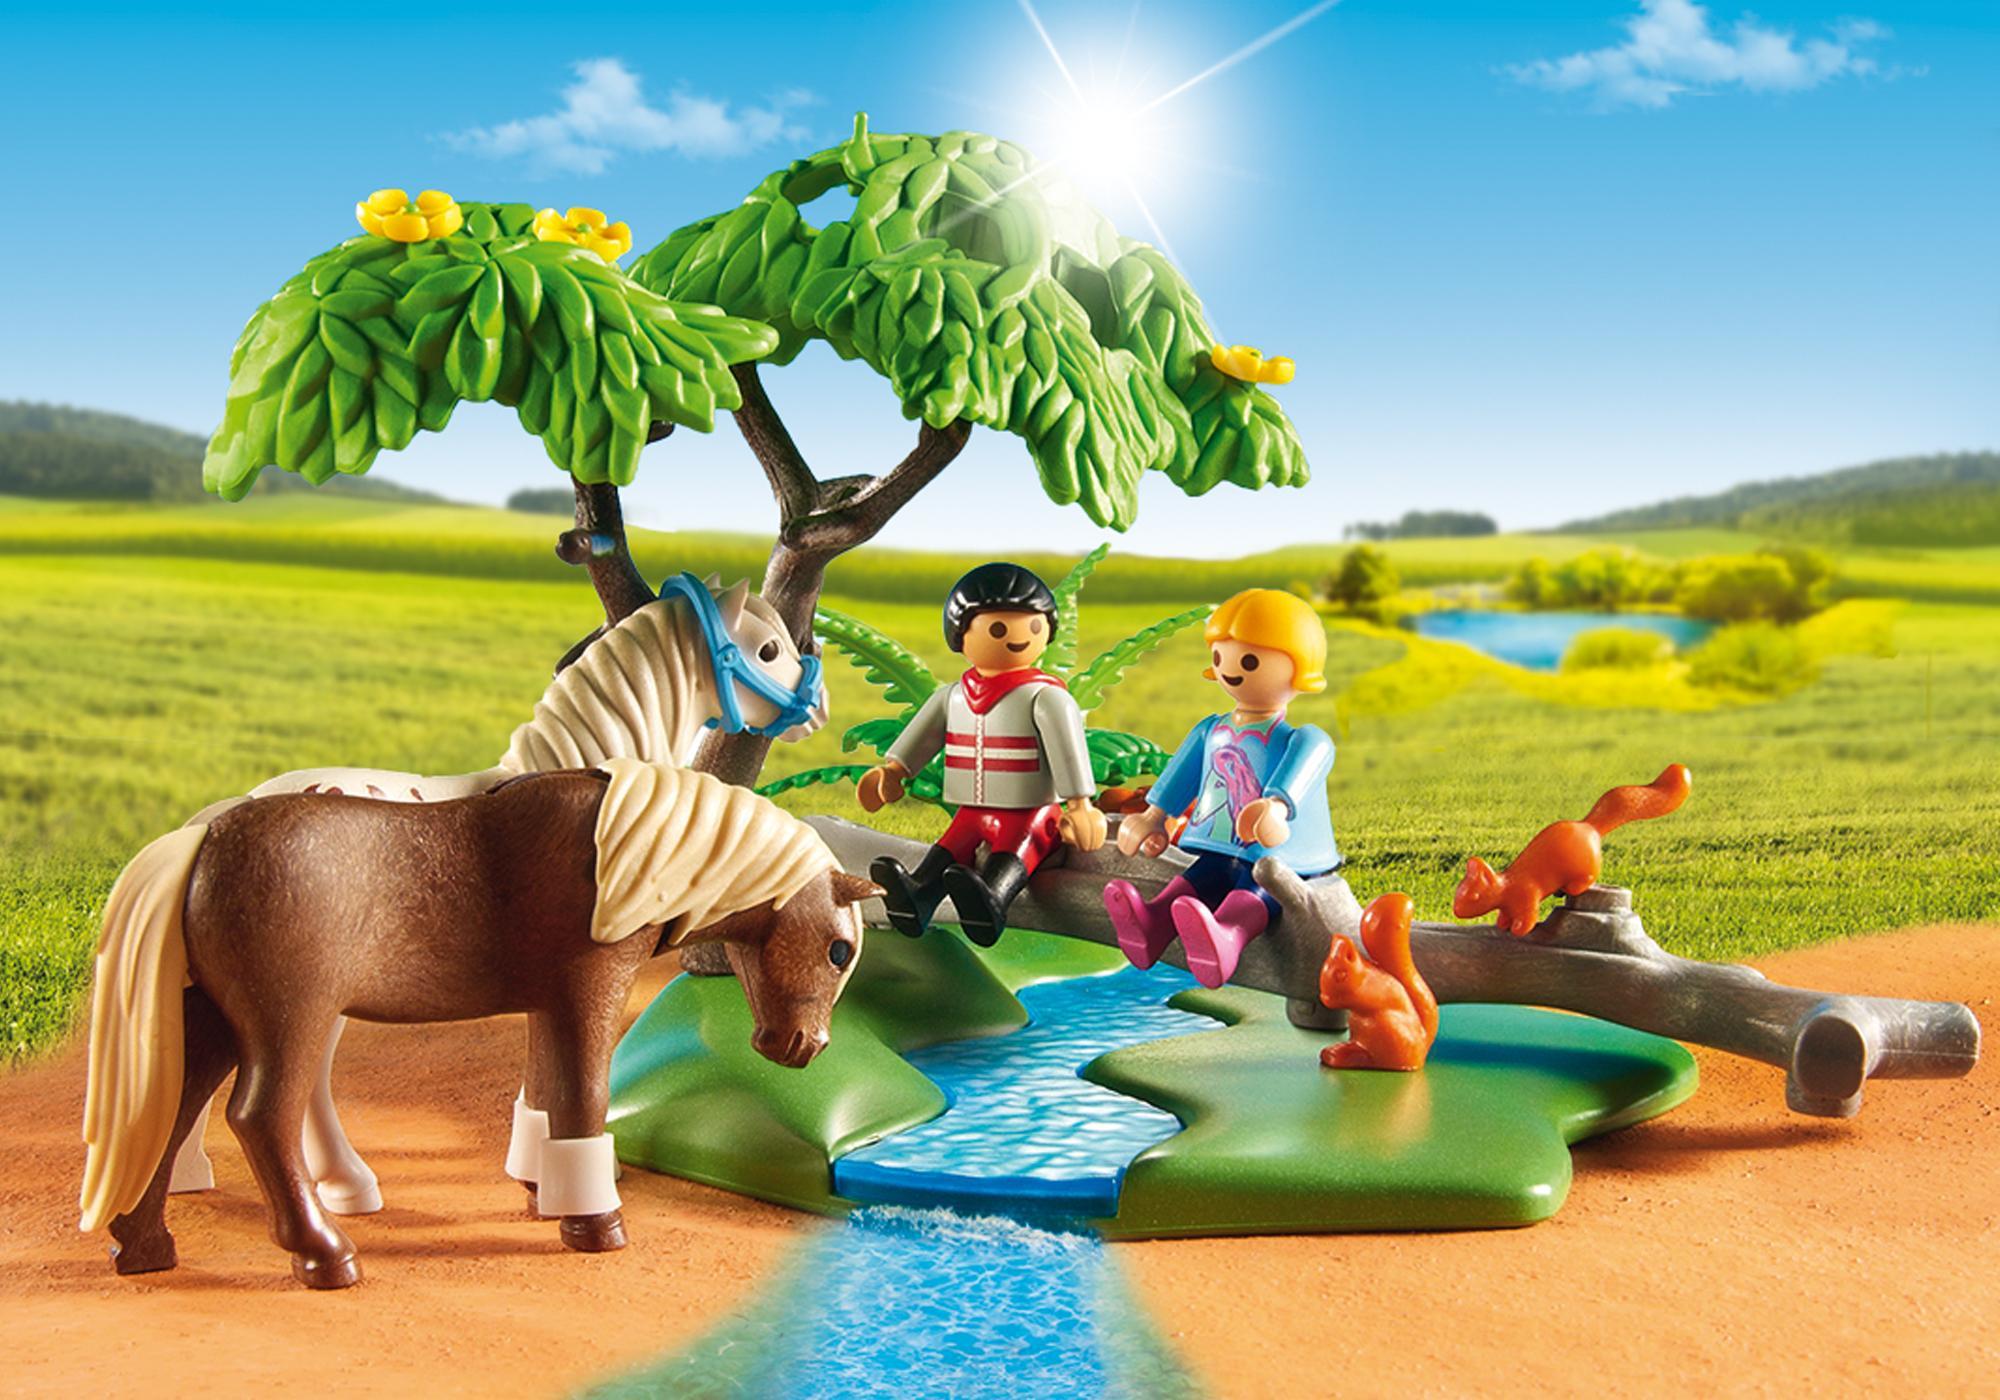 http://media.playmobil.com/i/playmobil/6947_product_extra1/Παιδάκια με πόνυ και εκπαιδευτής με άλογο